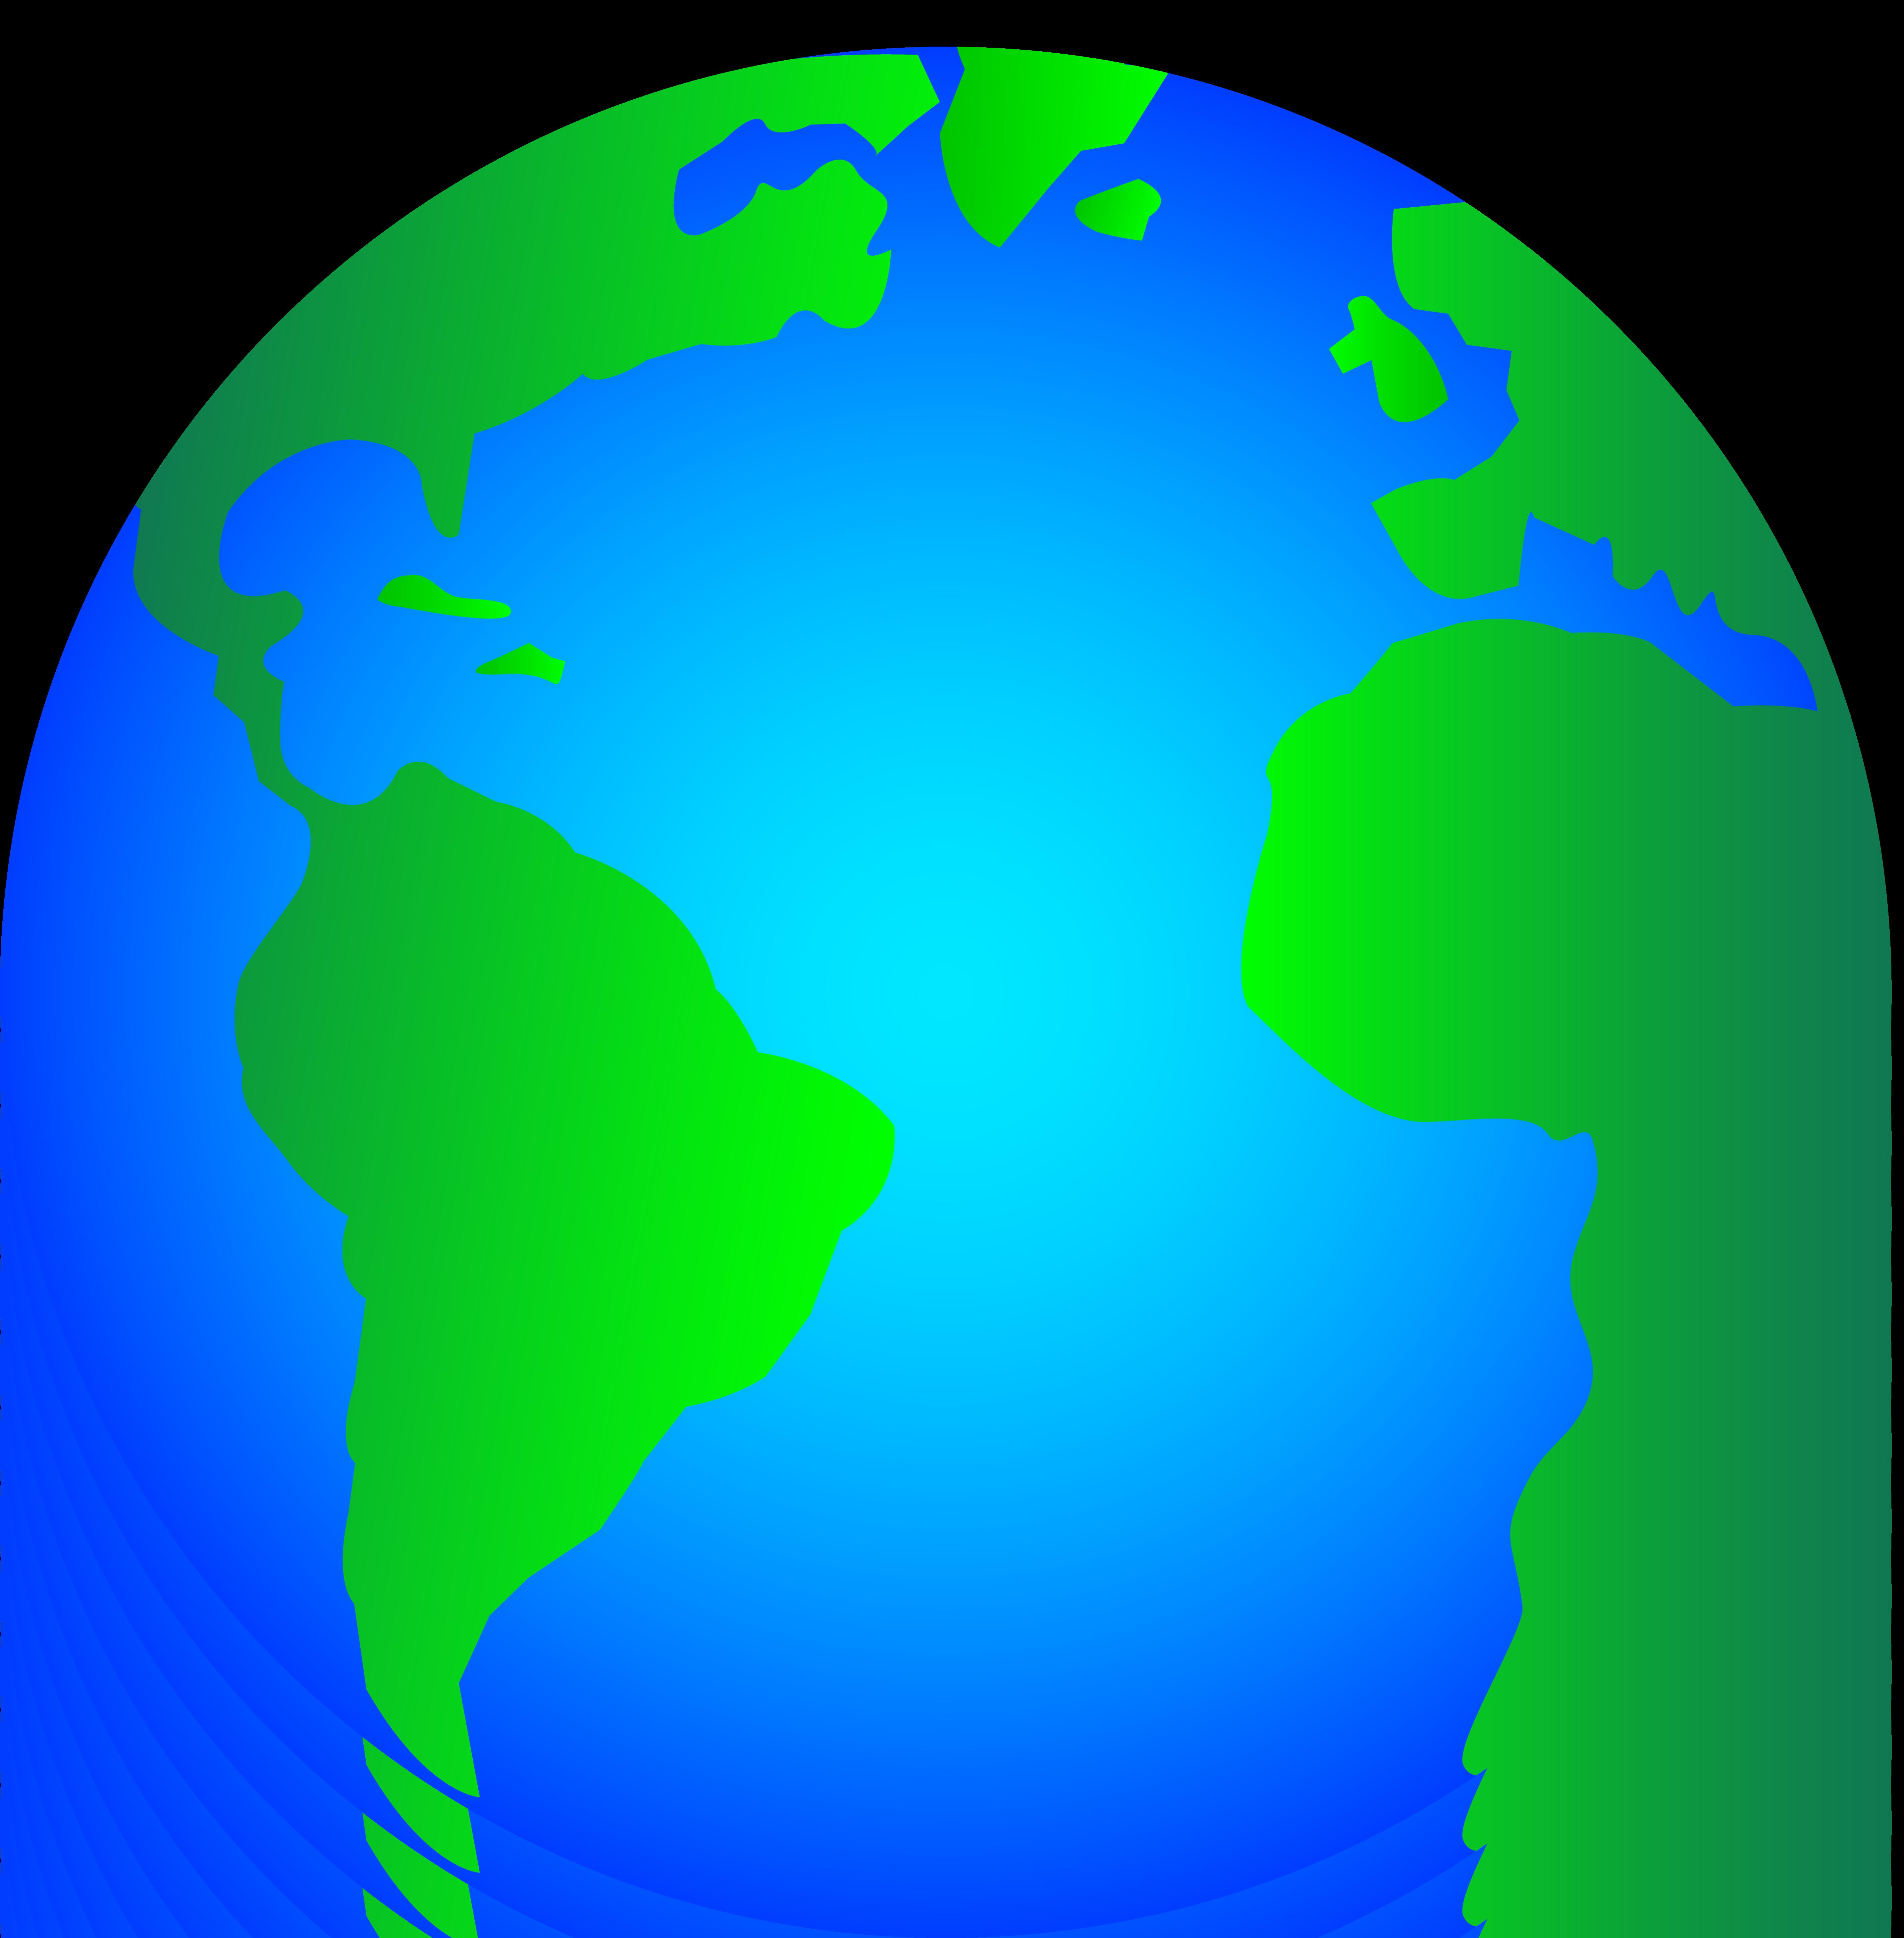 Globe earth cliparts